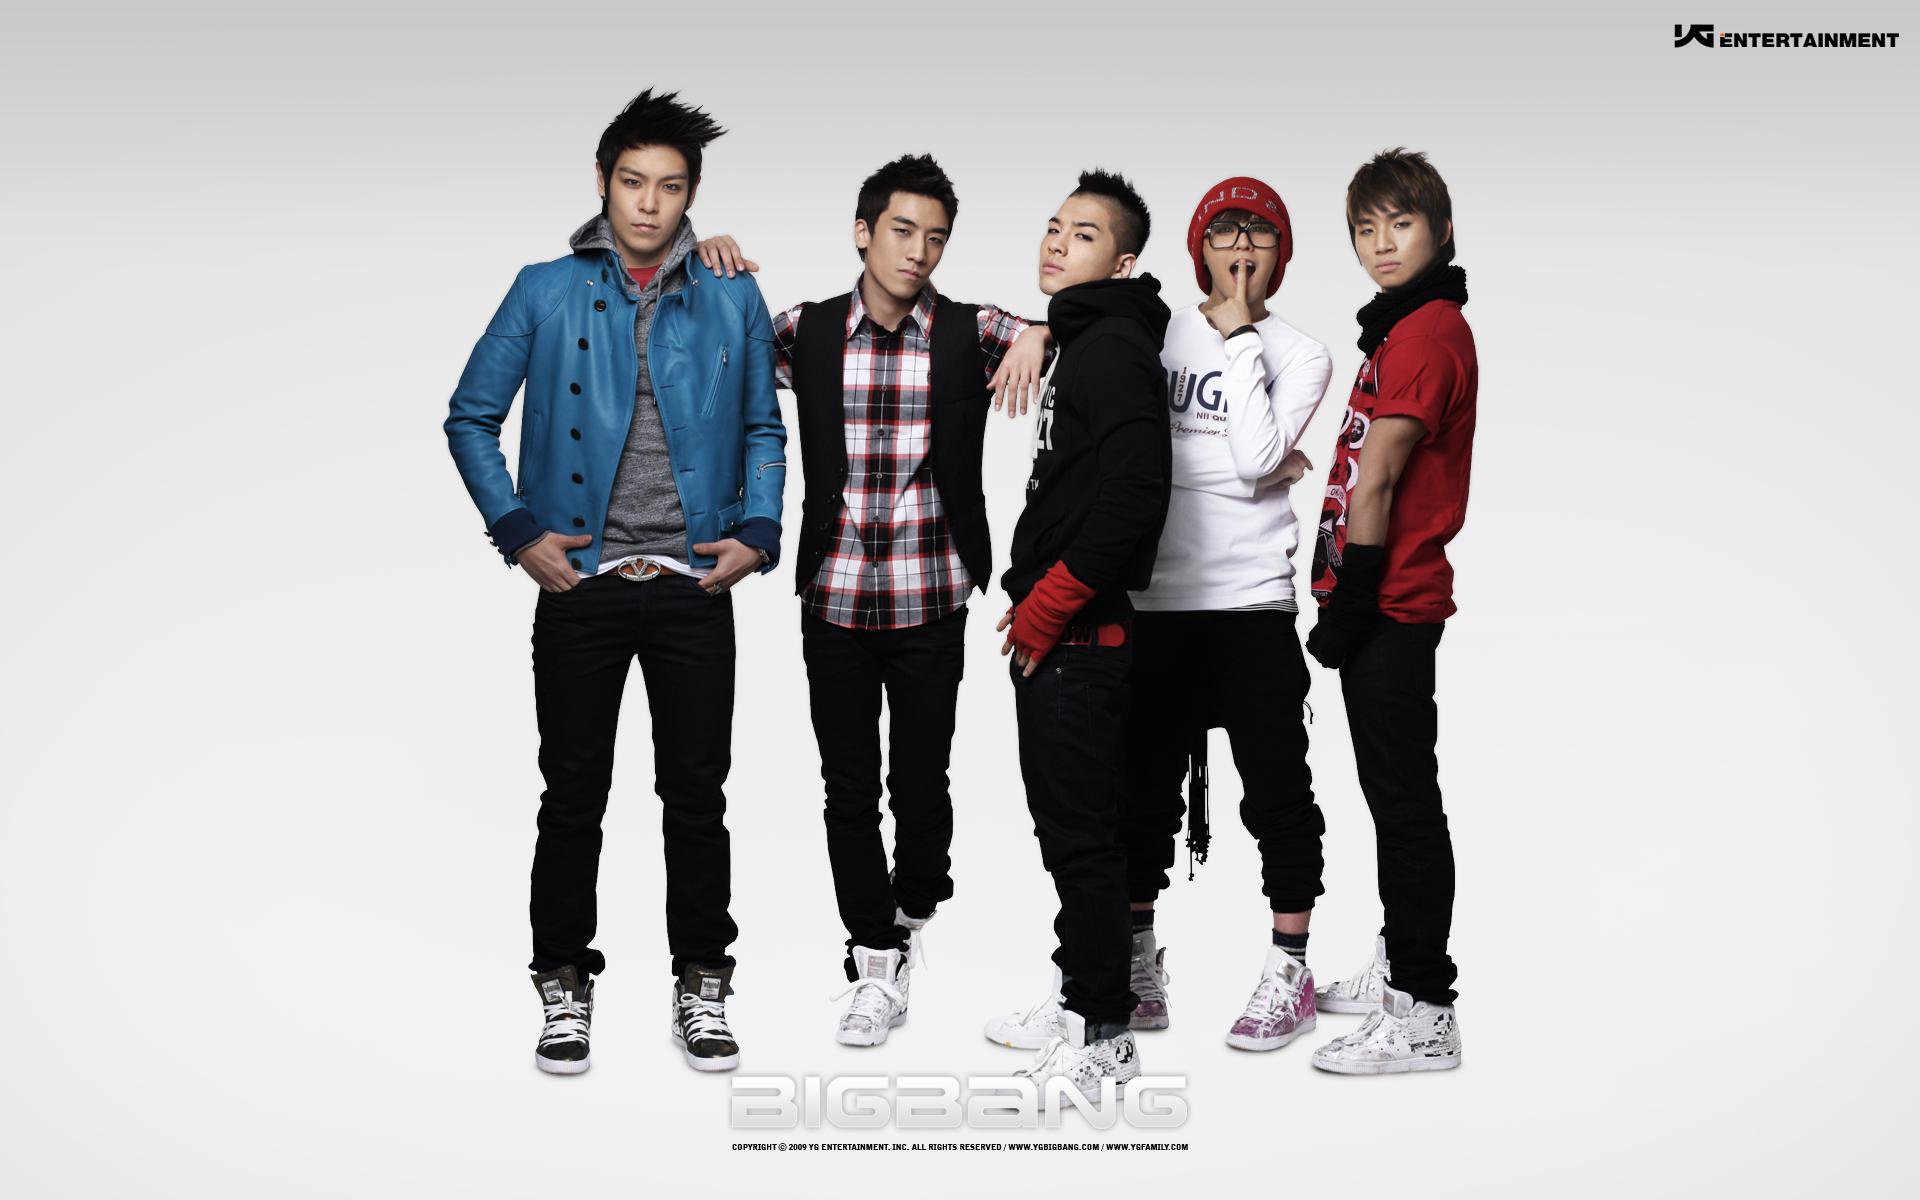 Bigbang Hd Wallpaper 1390 Asiachan Kpop Image Board